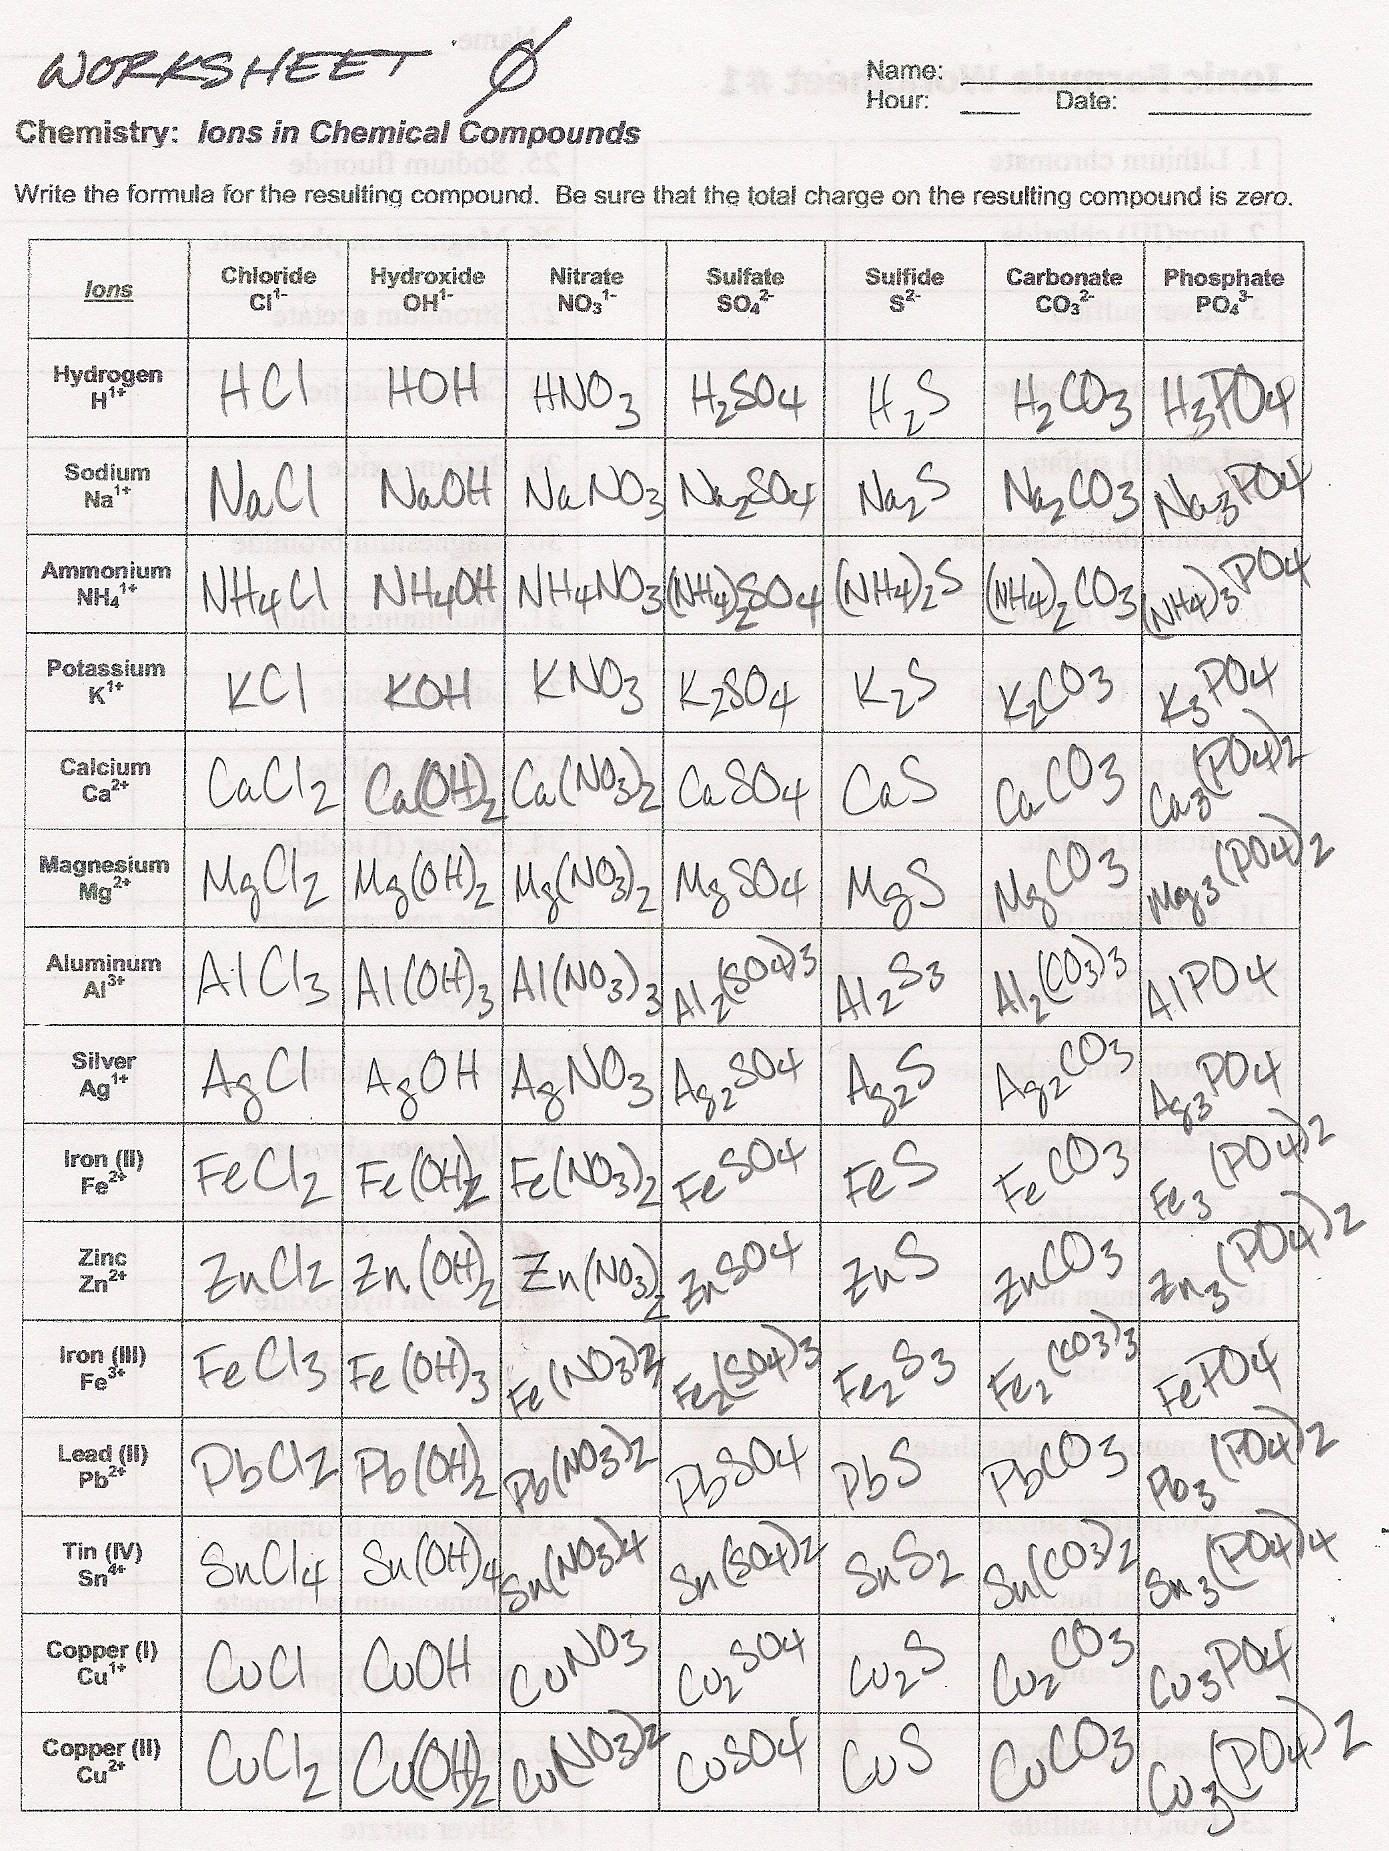 Writing Ionic formulas Worksheet Traditional Chemistry Ionic formulas Worksheet Answers